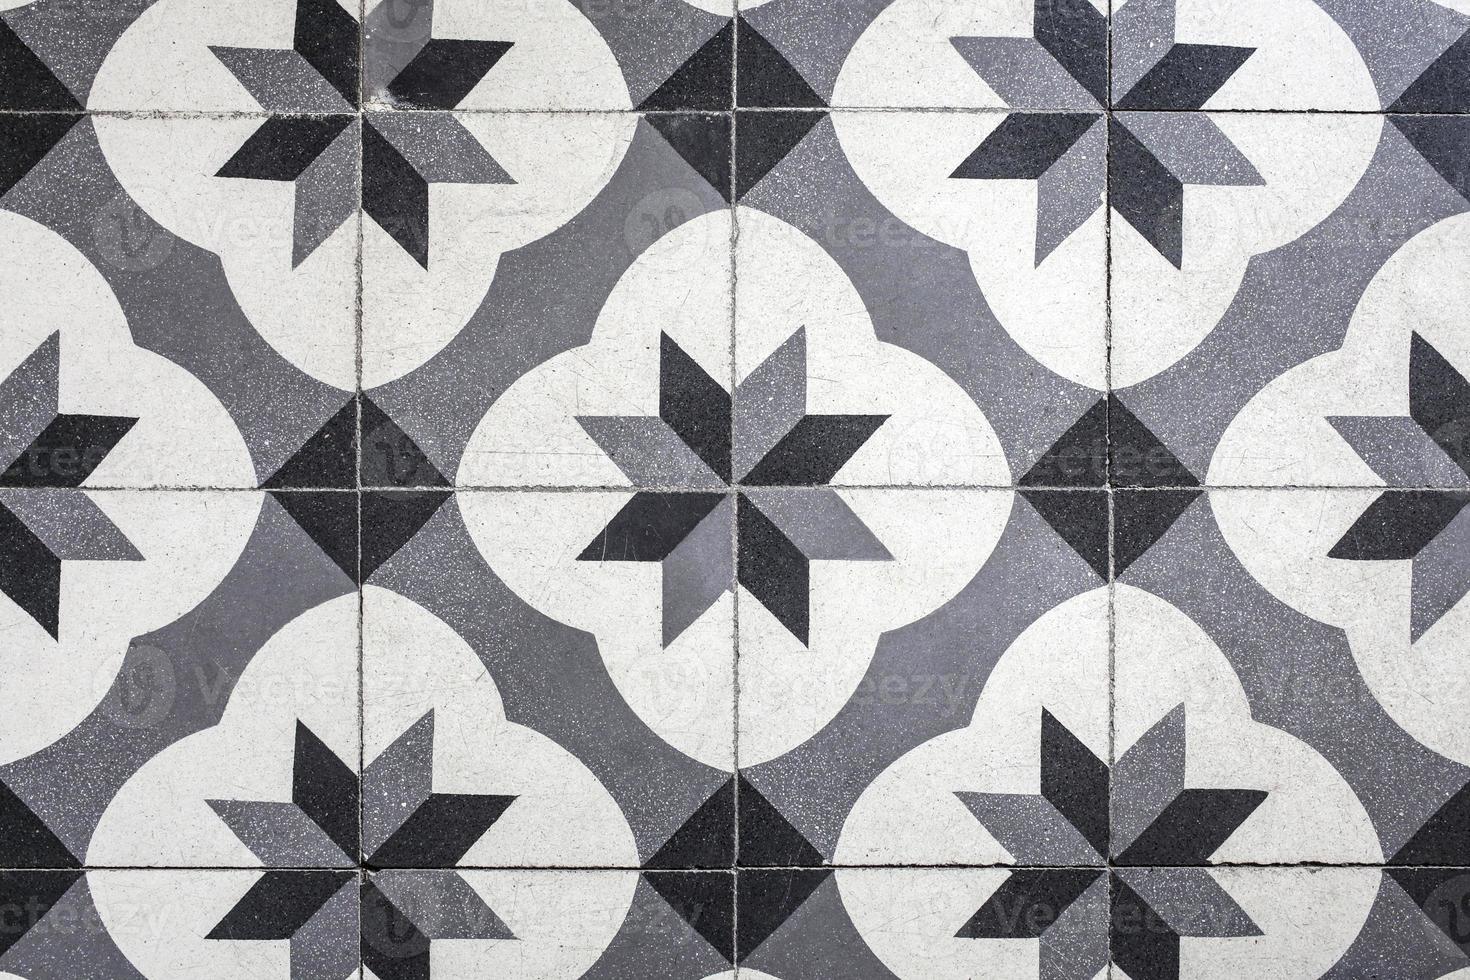 cerámica de piso vintage foto